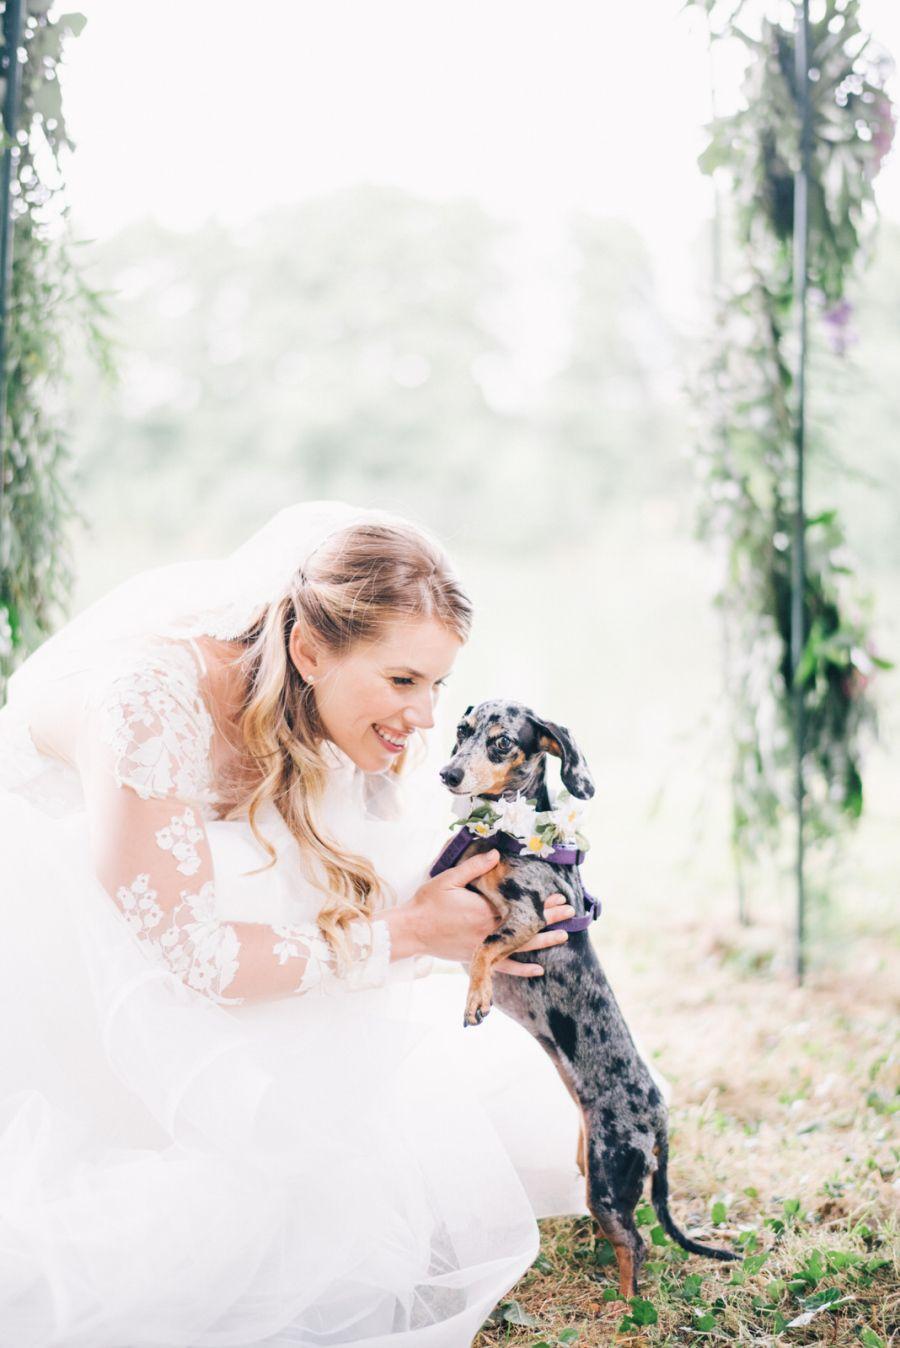 Scottish tartan wedding dress  A Gorgeous Alfresco Wedding in France Thatus  Vegan  Wedding